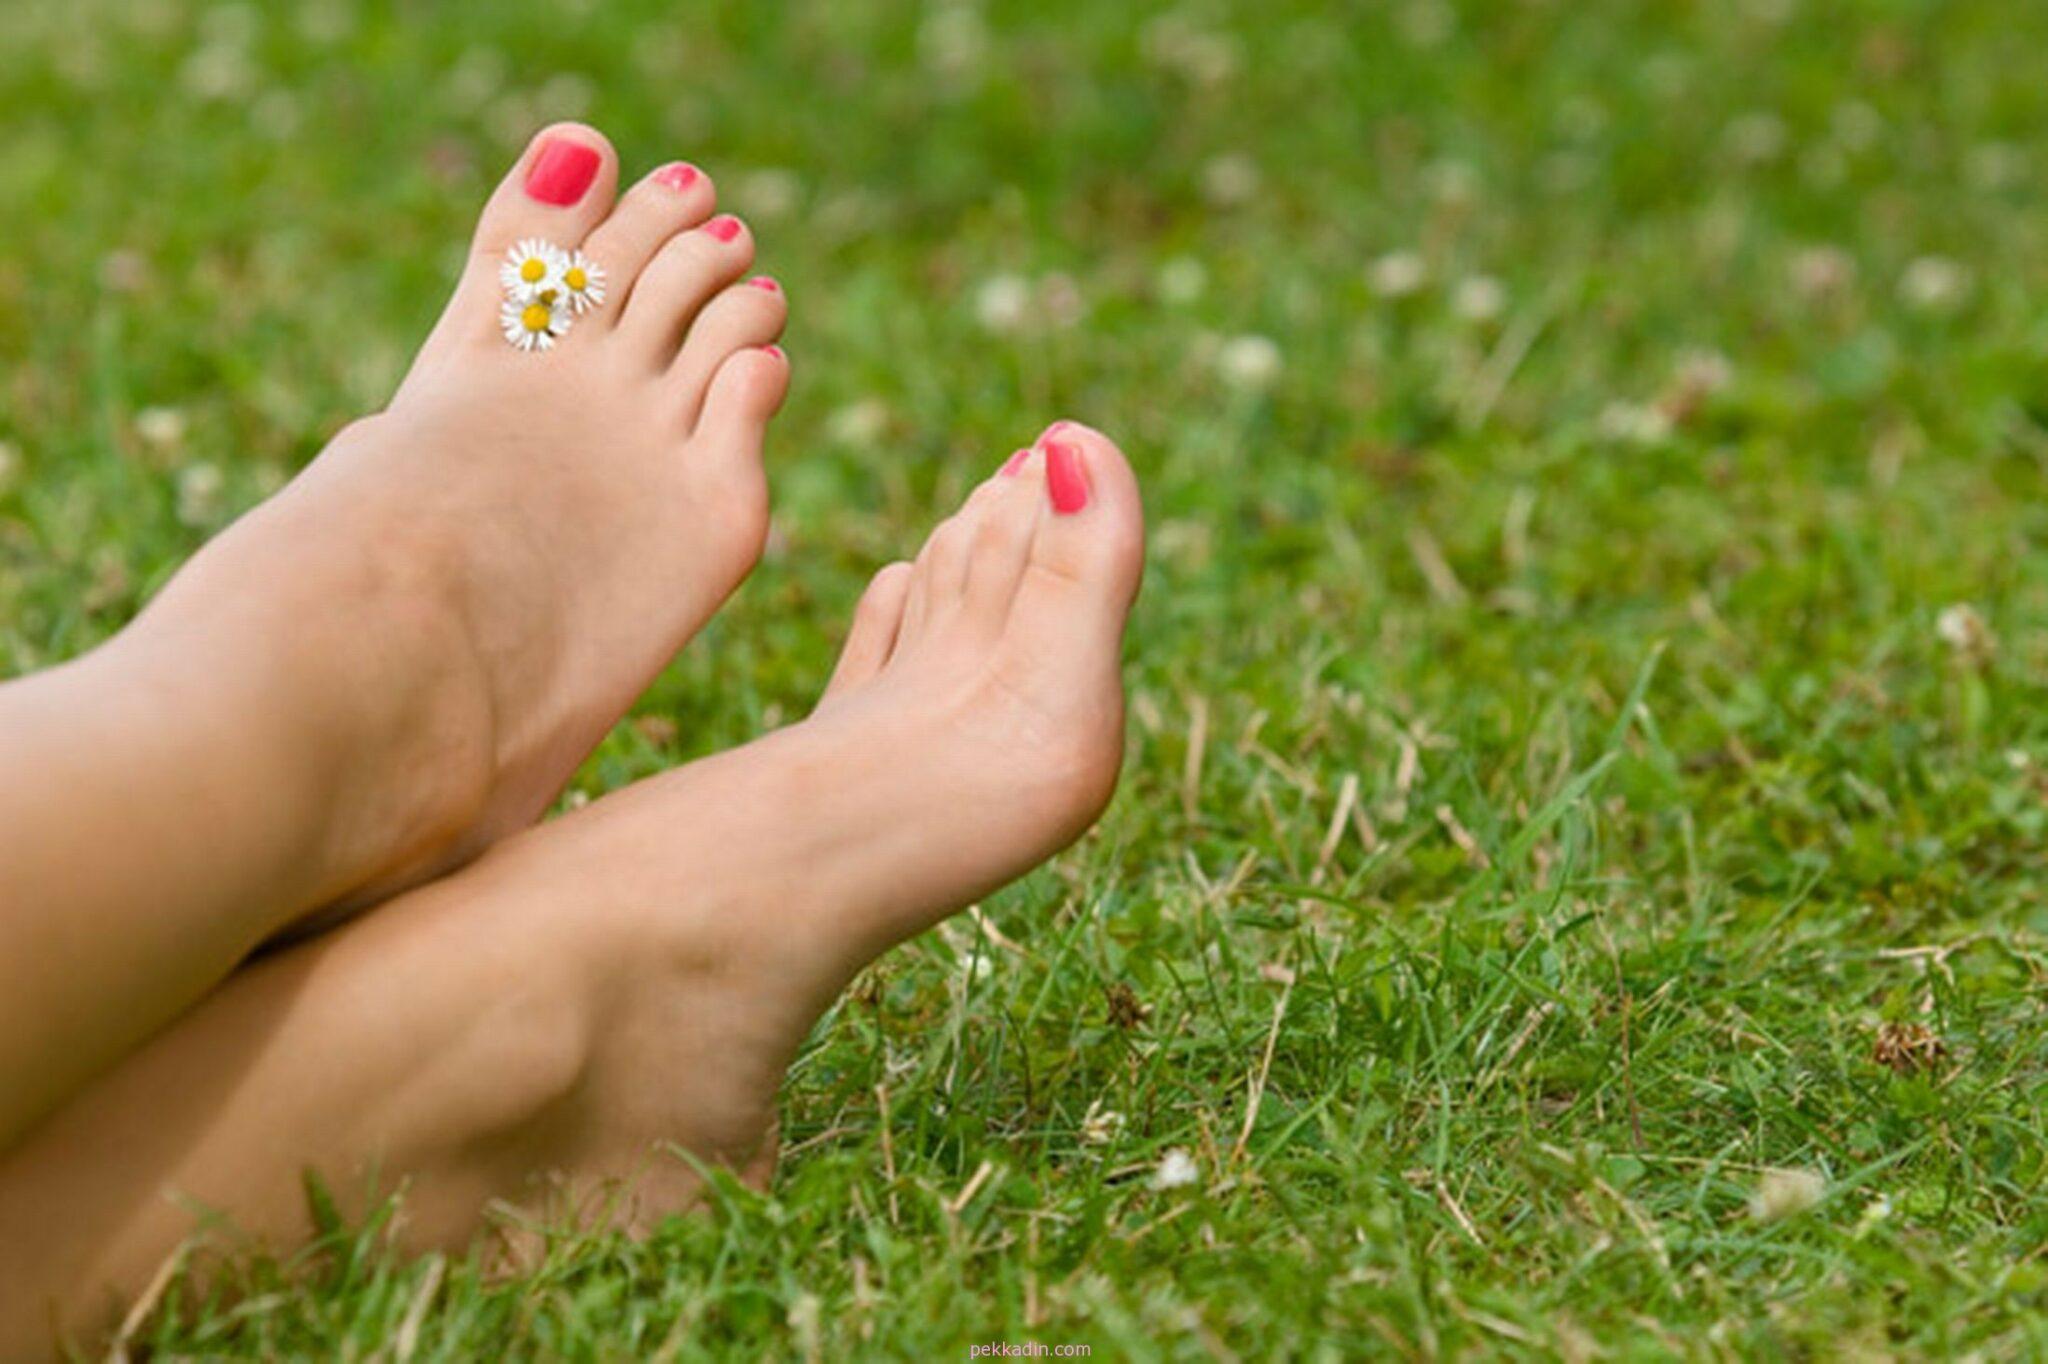 Фото пяток ног девушек 1 фотография